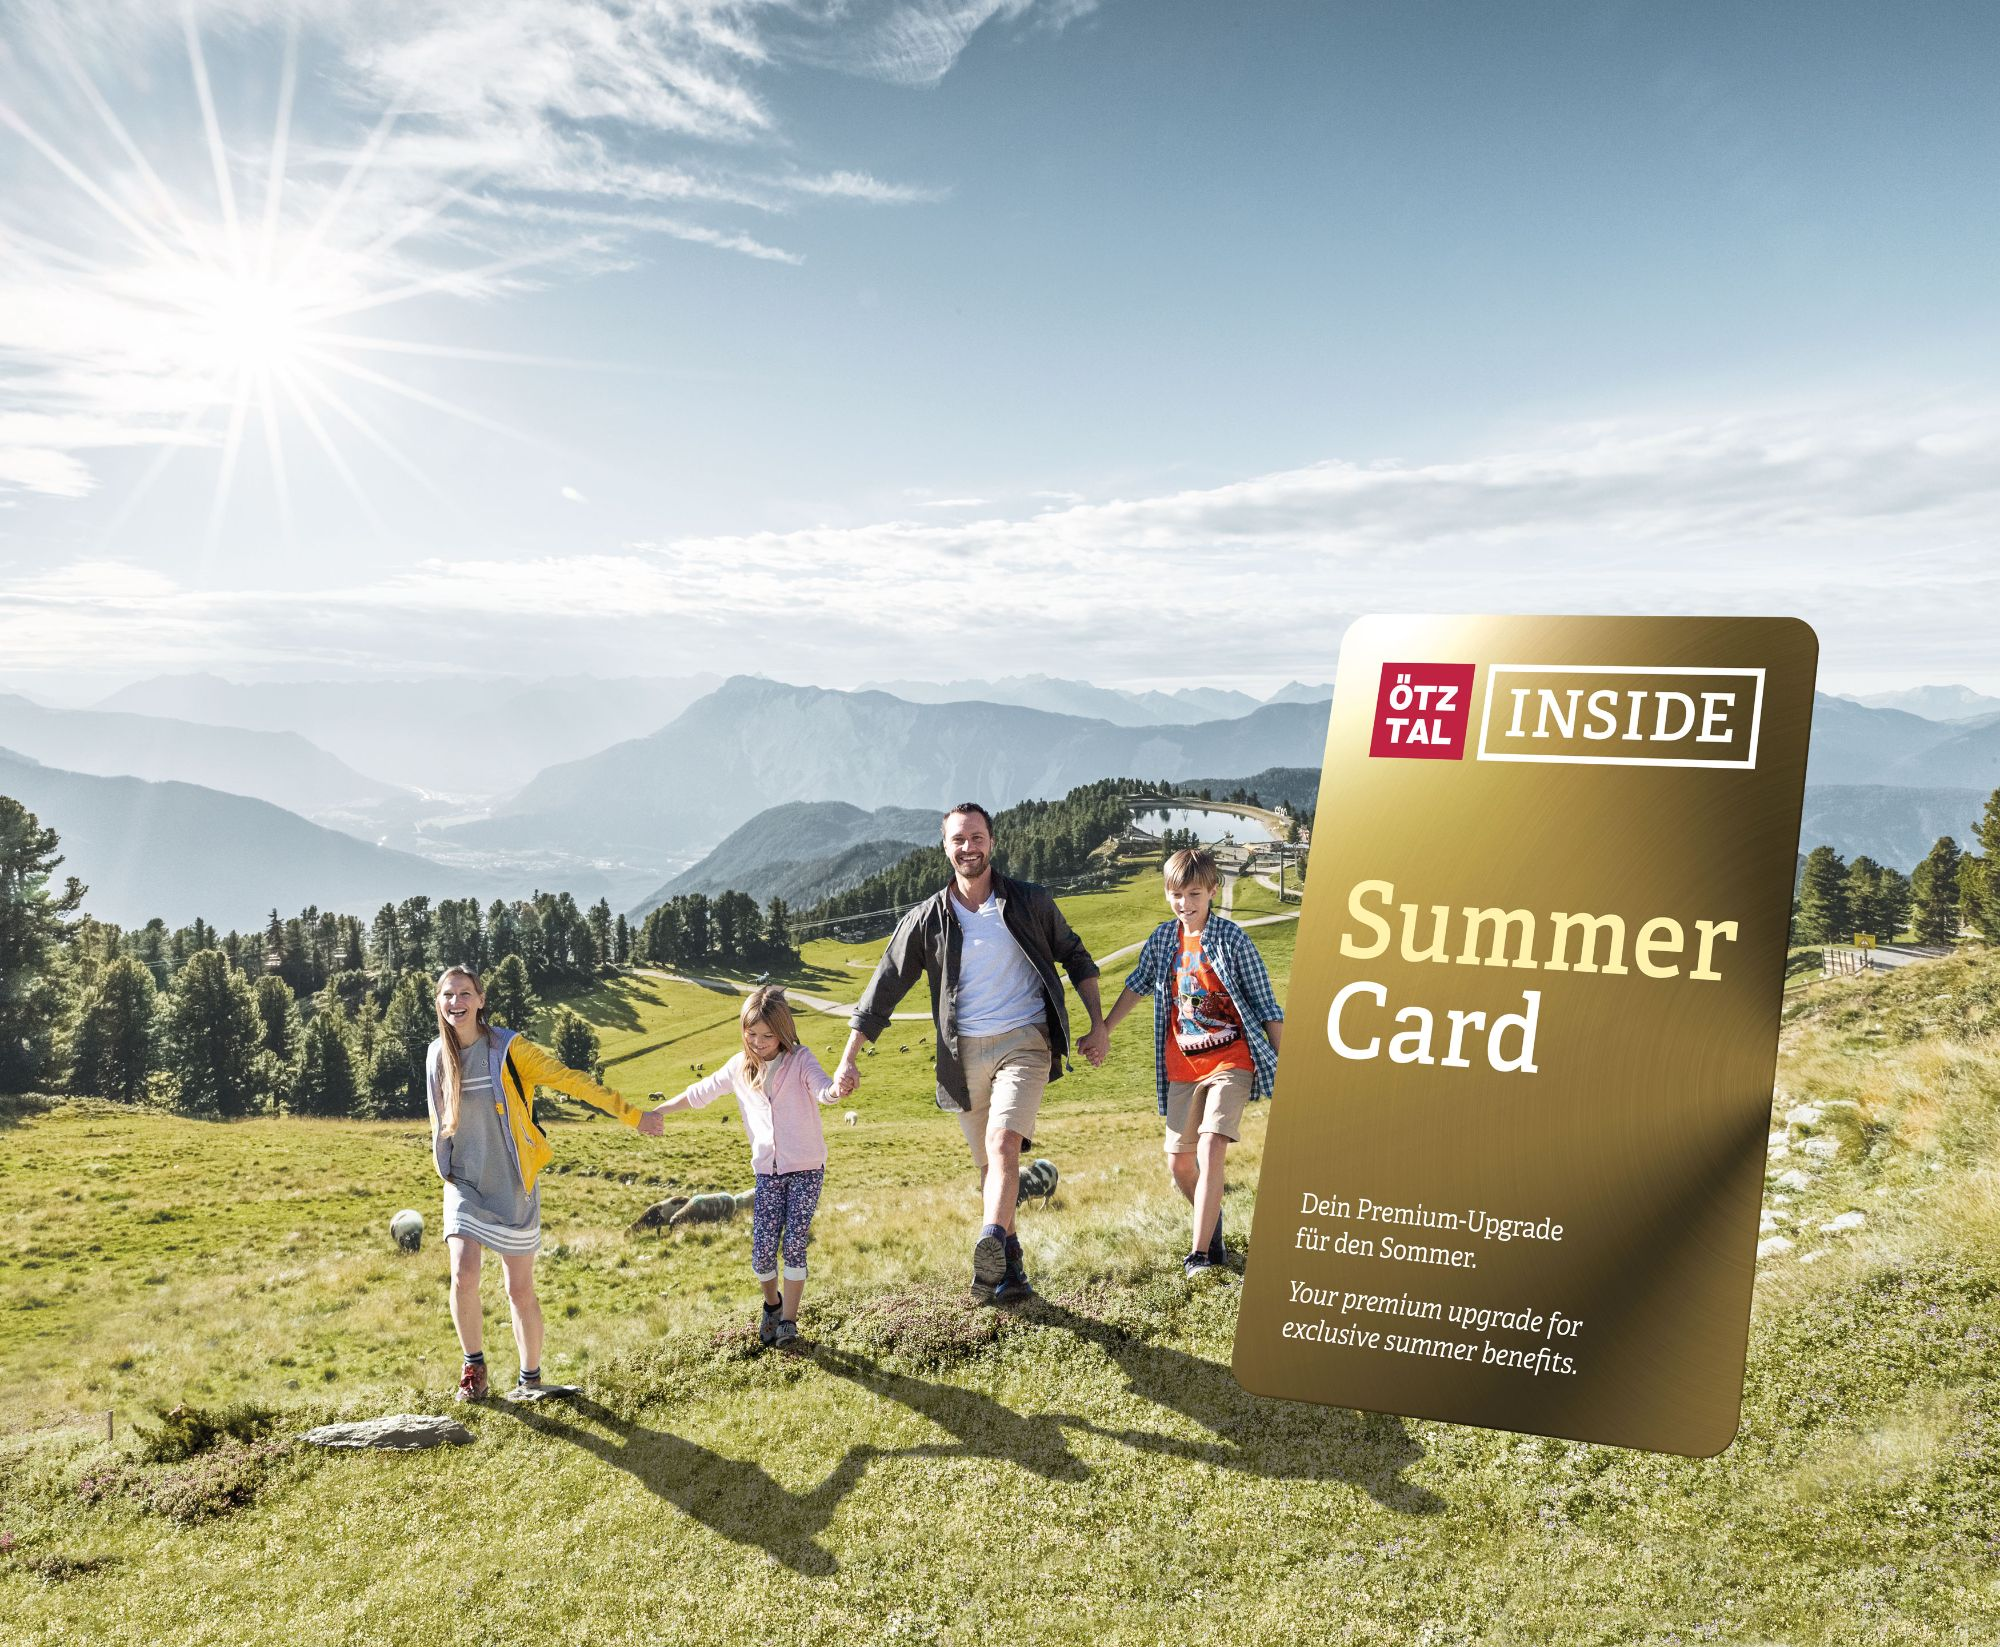 Ötztal Inside Summer Card | Ötztal | oetztal.com